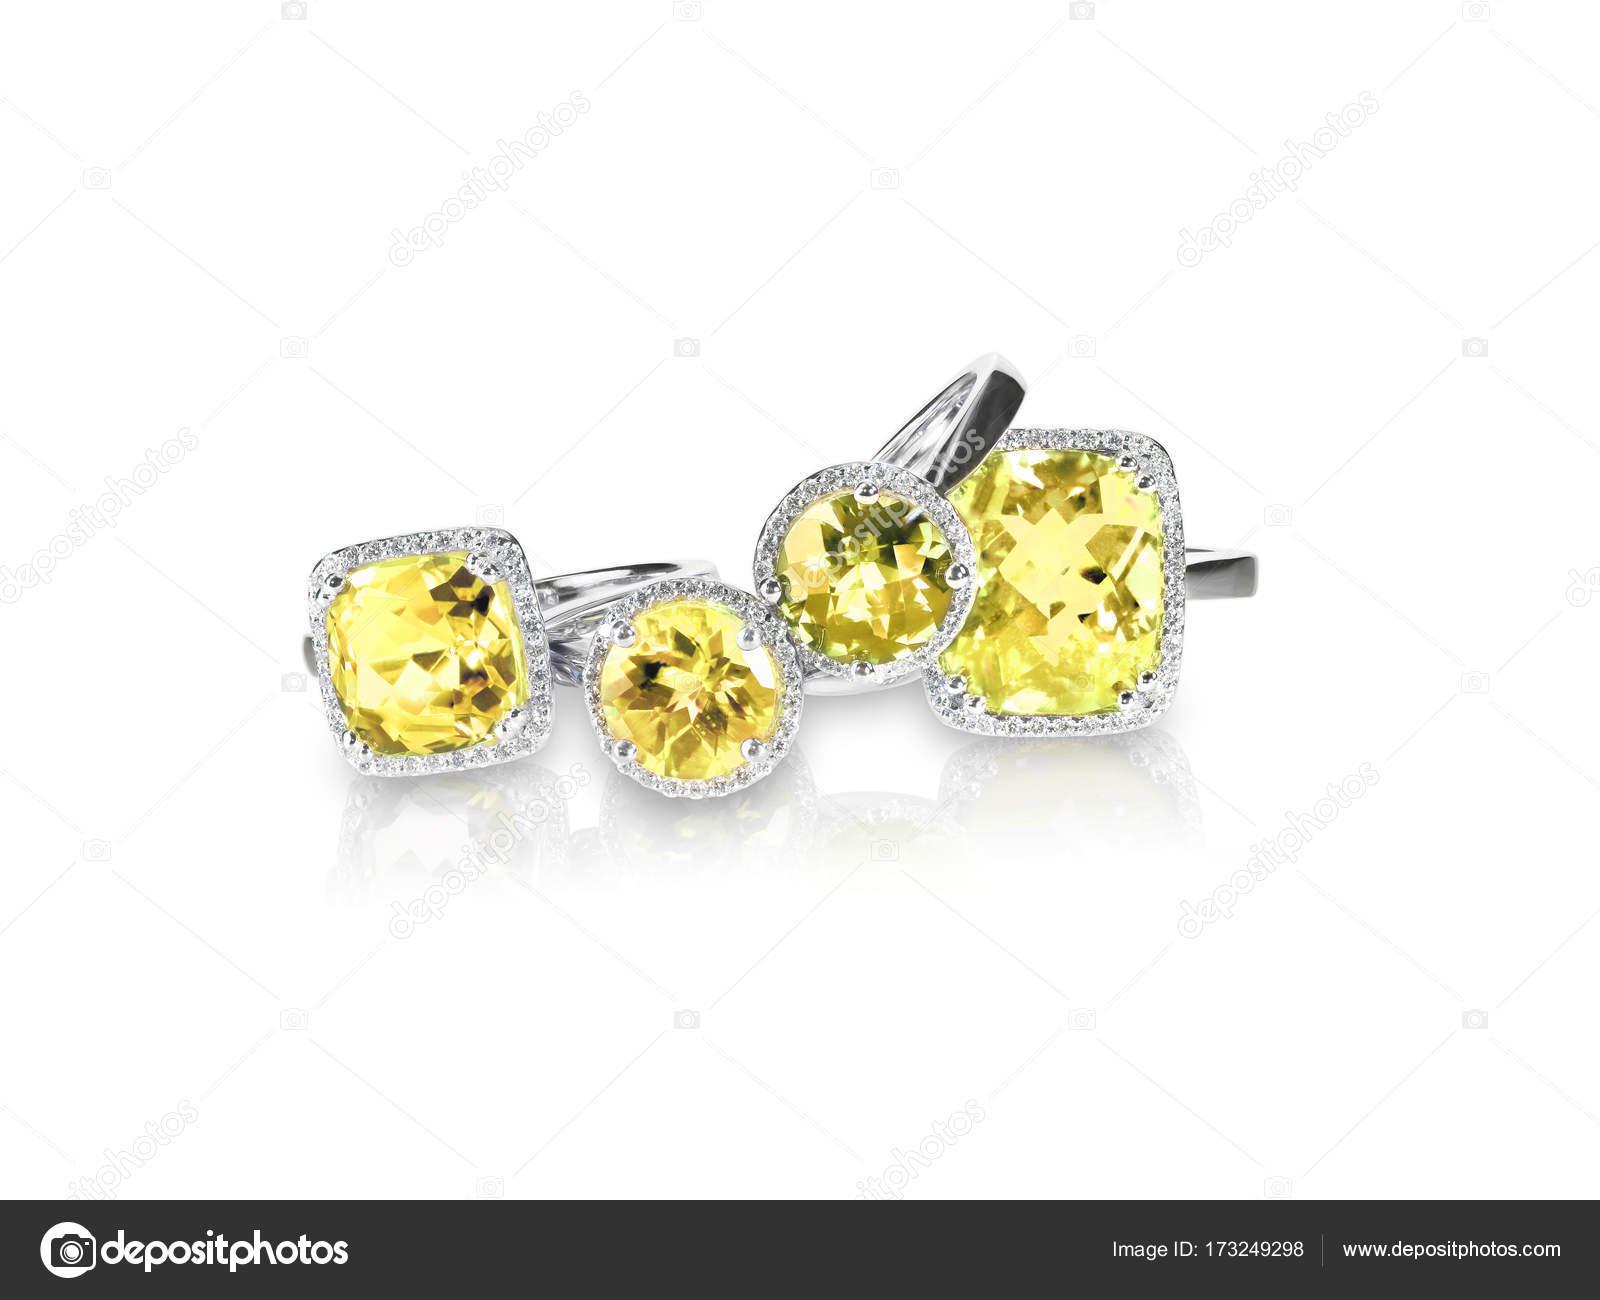 96467cd0908c Pila de grupo o cluster de múltiples anillos de diamante piedras preciosas  - piedra citrina en ingles — Foto de fruitcocktailcreative